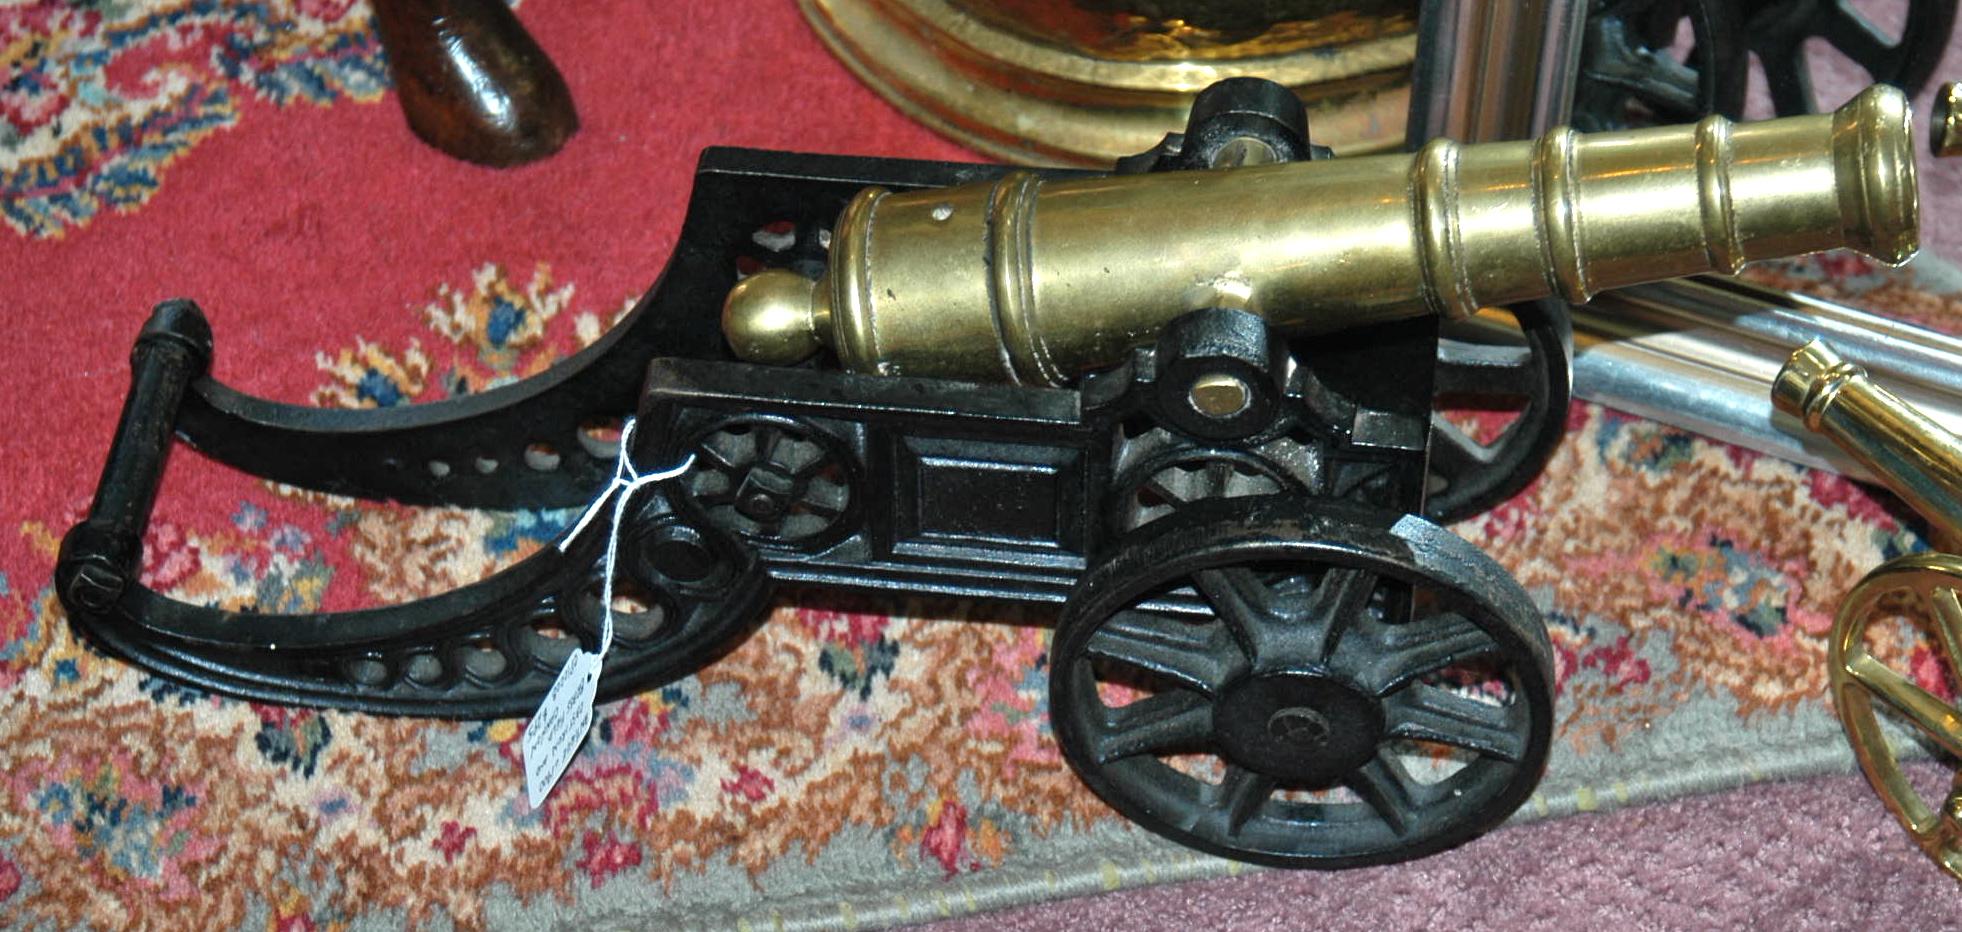 Antiques com | Classifieds| Antiques » Militaria For Sale